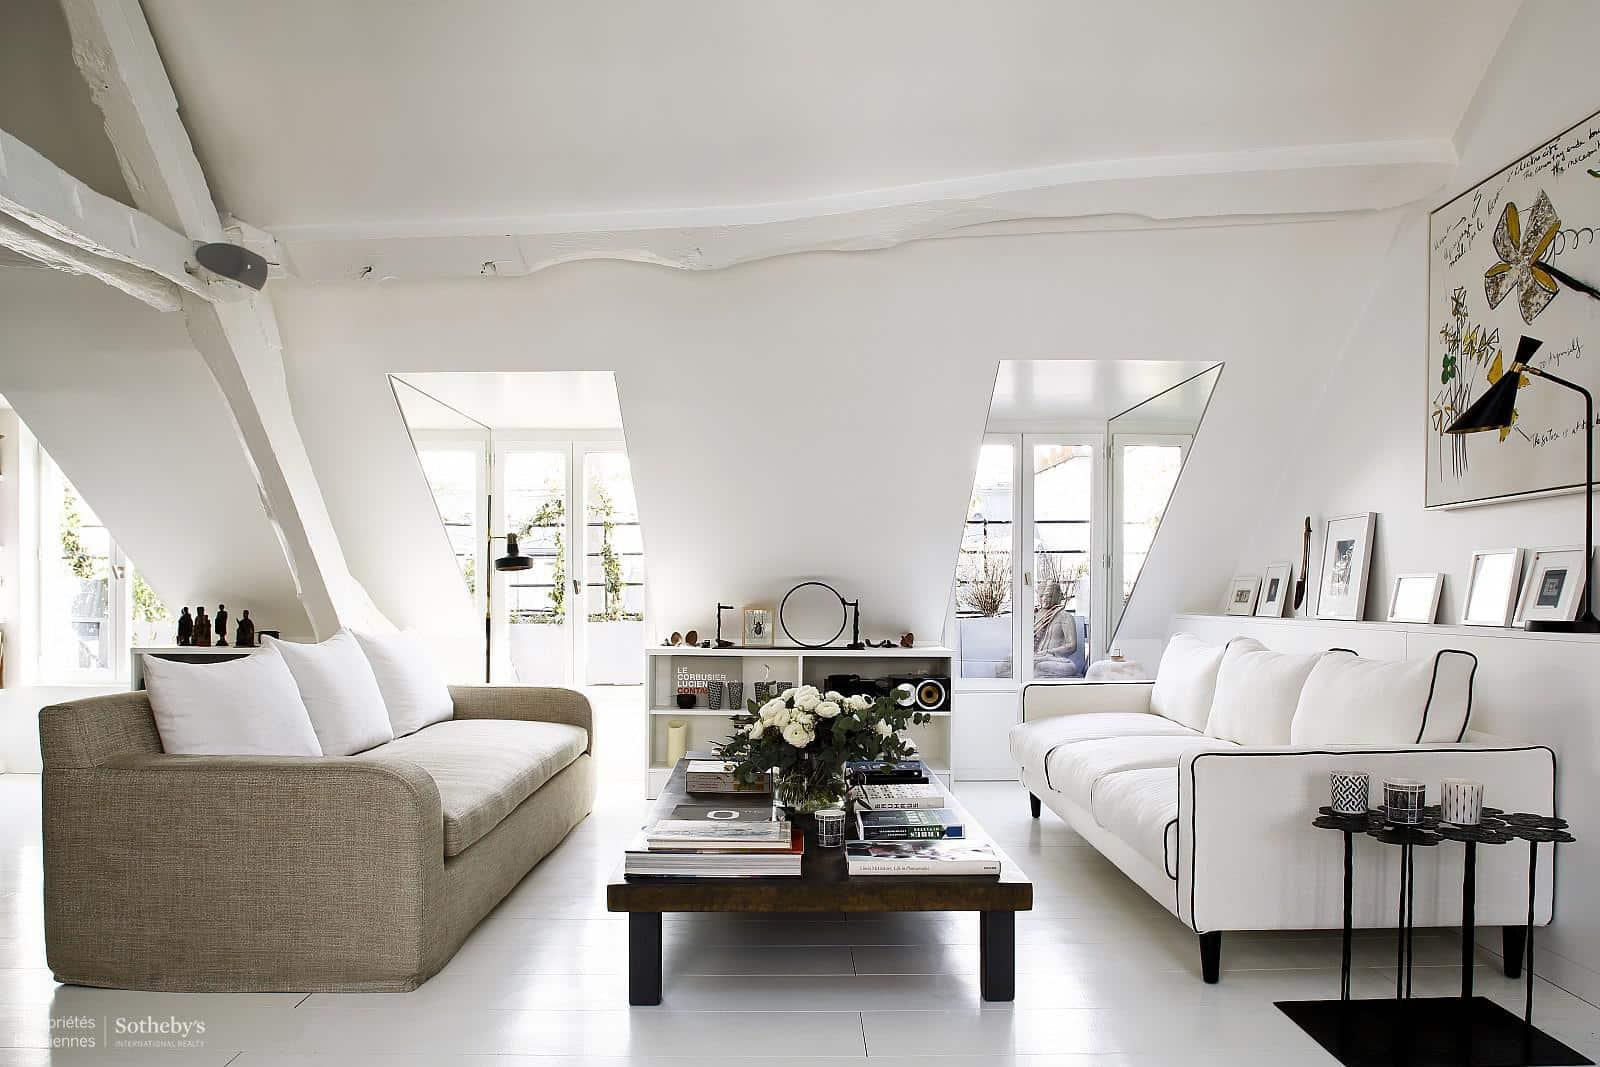 Superieur Paris Home For Sale Living Room Design. Multi Million Dollar Listing Week  Here ...